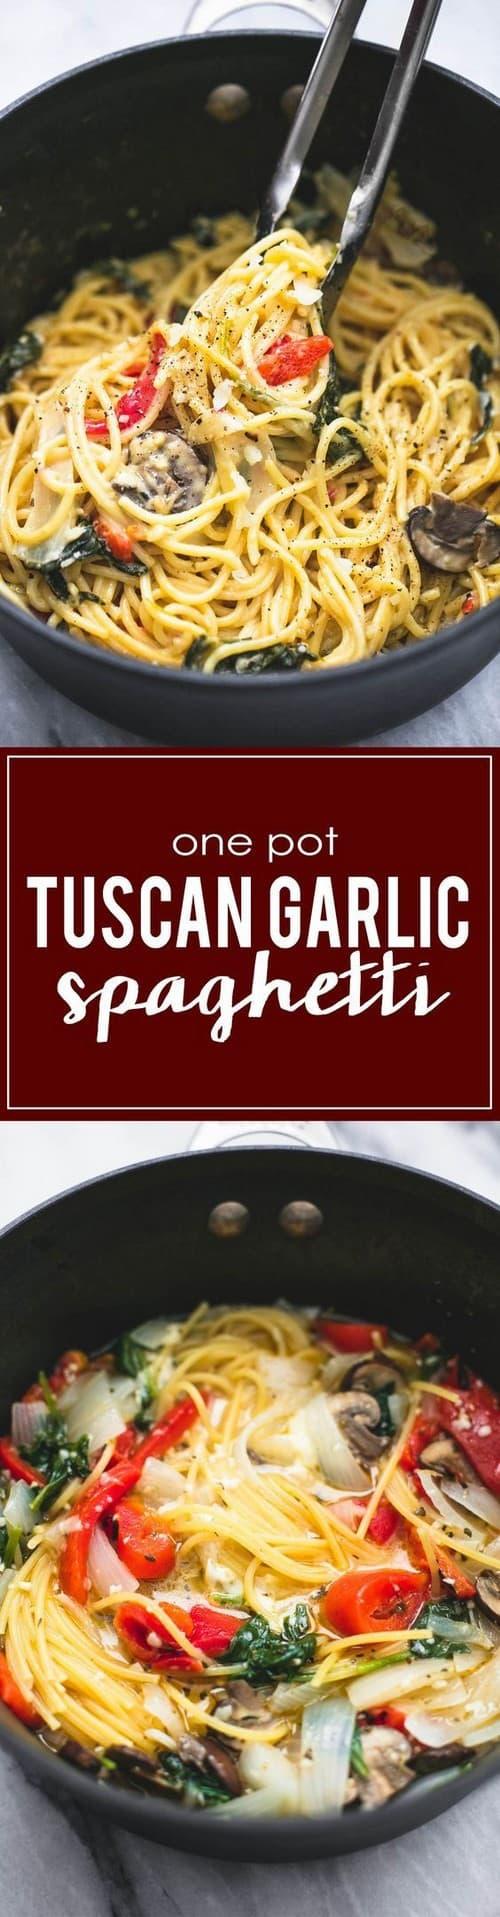 Mediterranean One Pot Creamy Tuscan Garlic Spaghetti